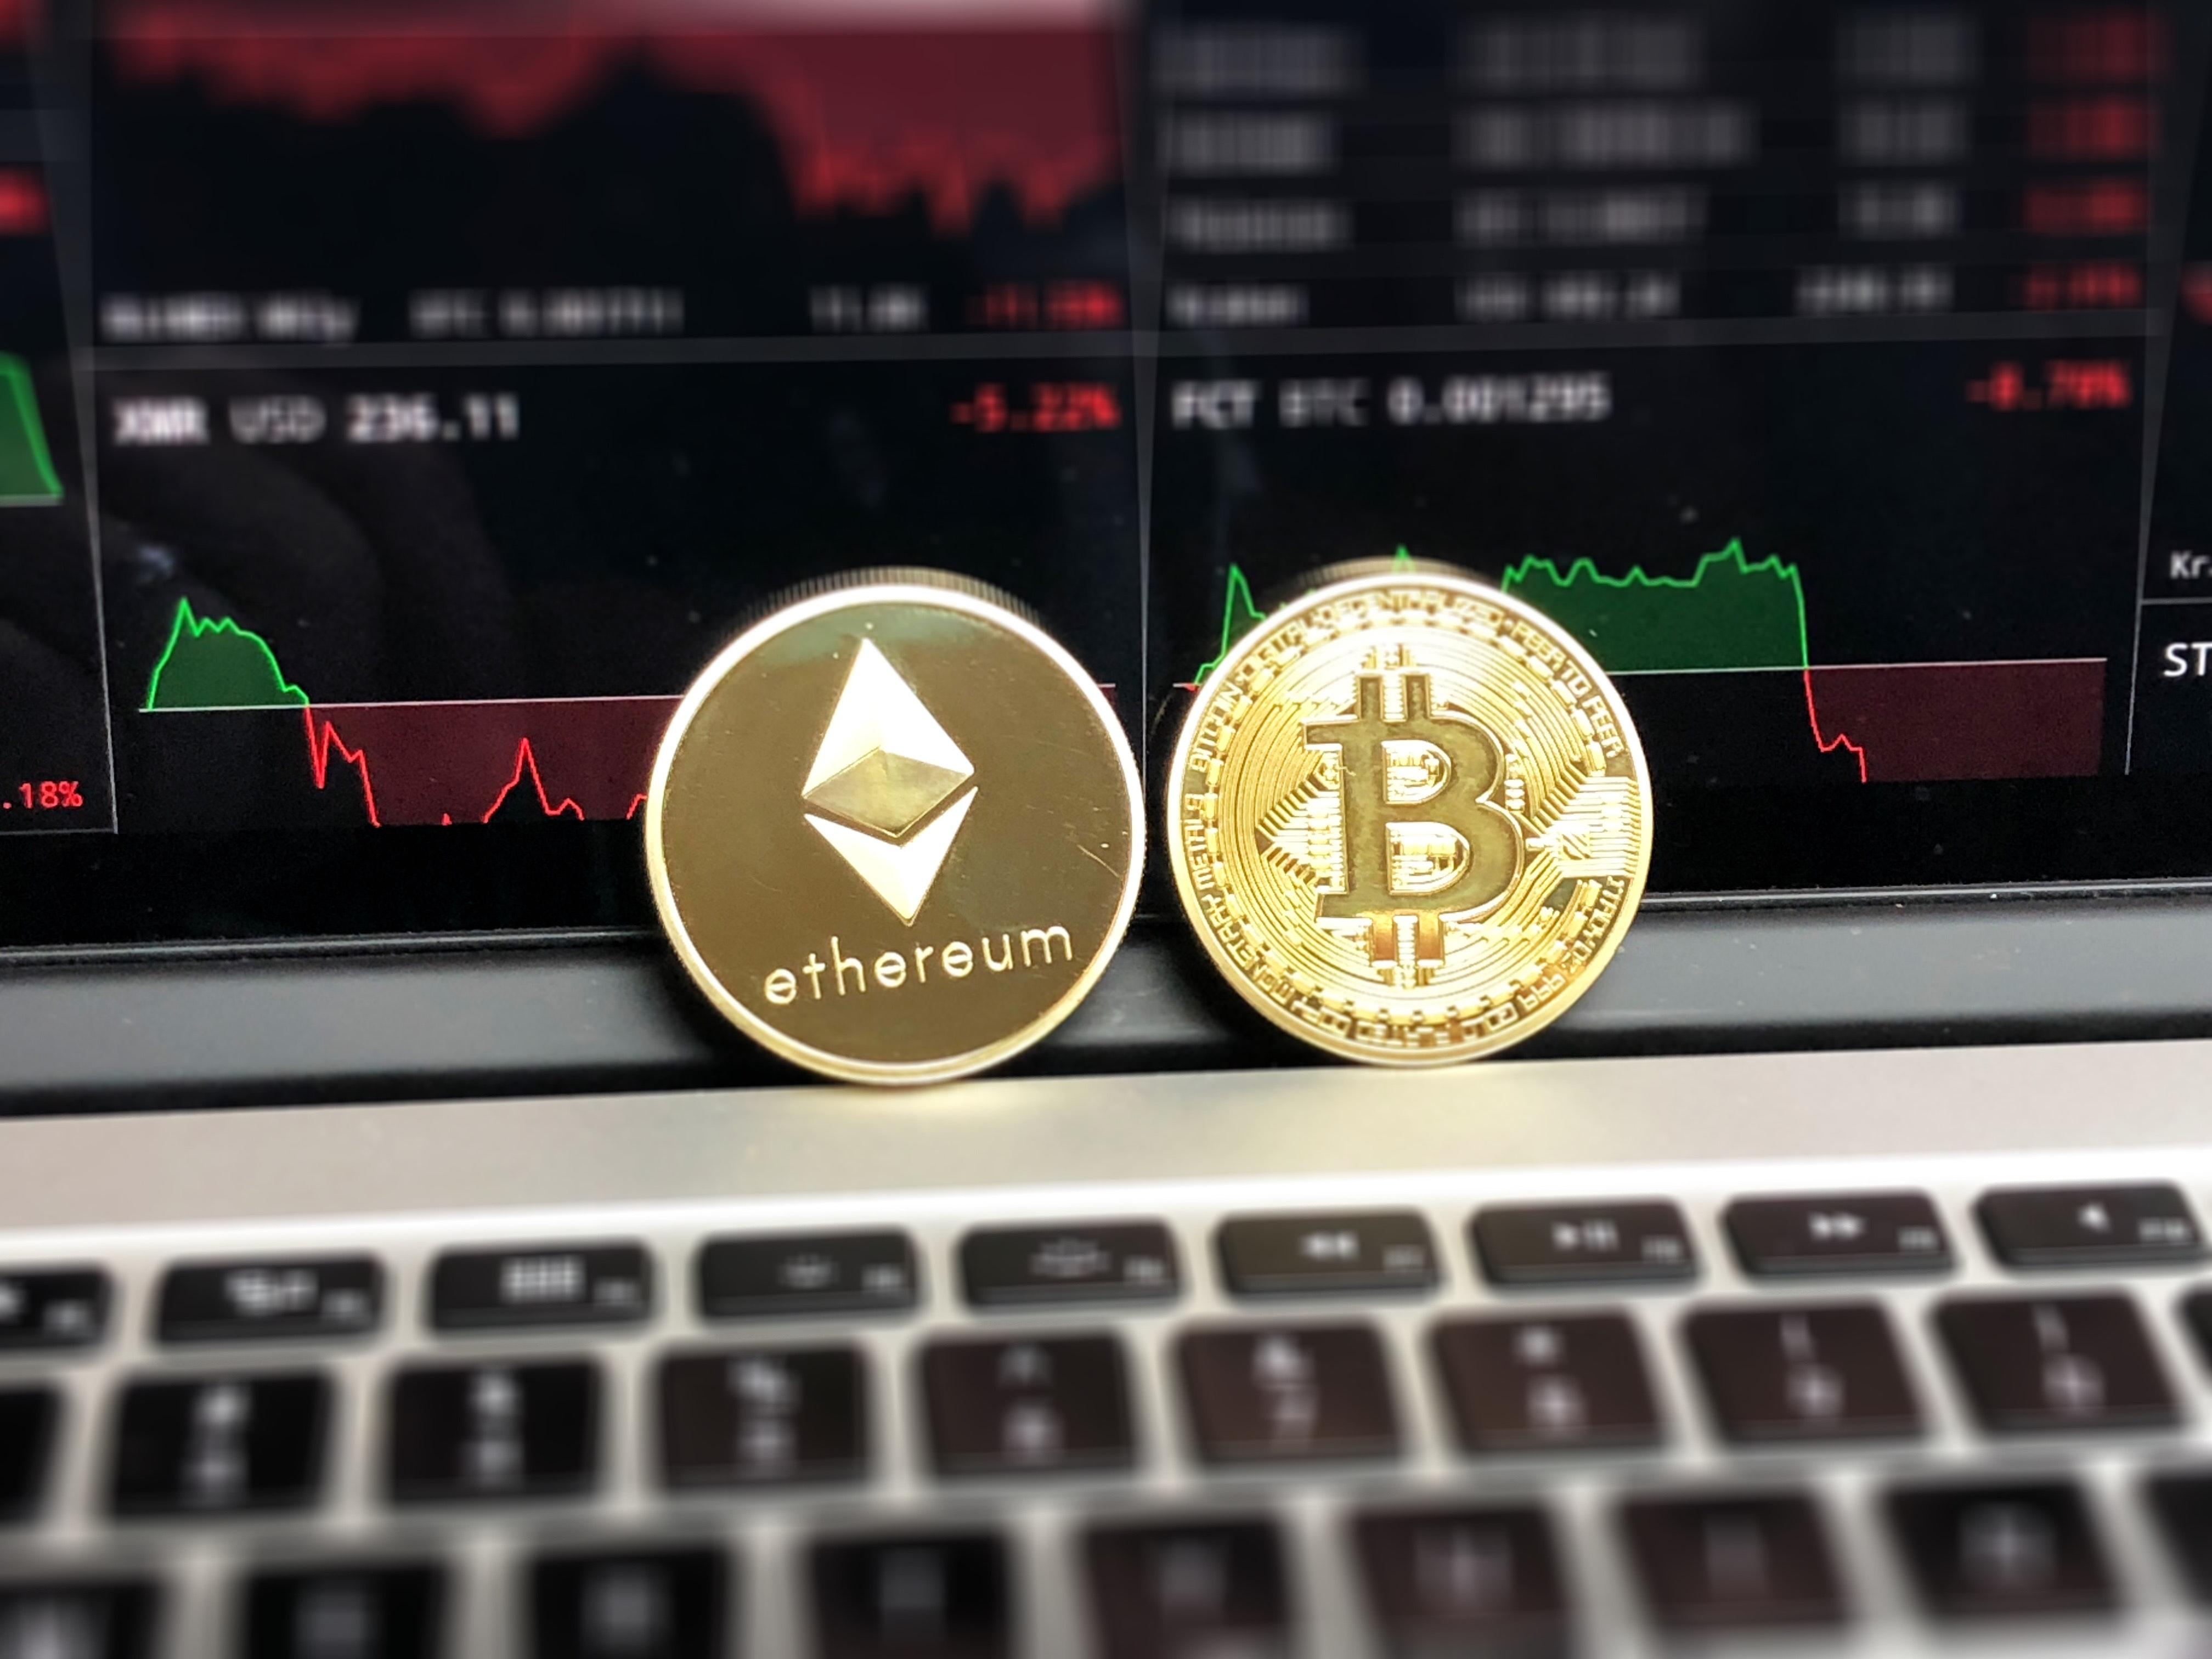 conselho de investimento criptomoeda